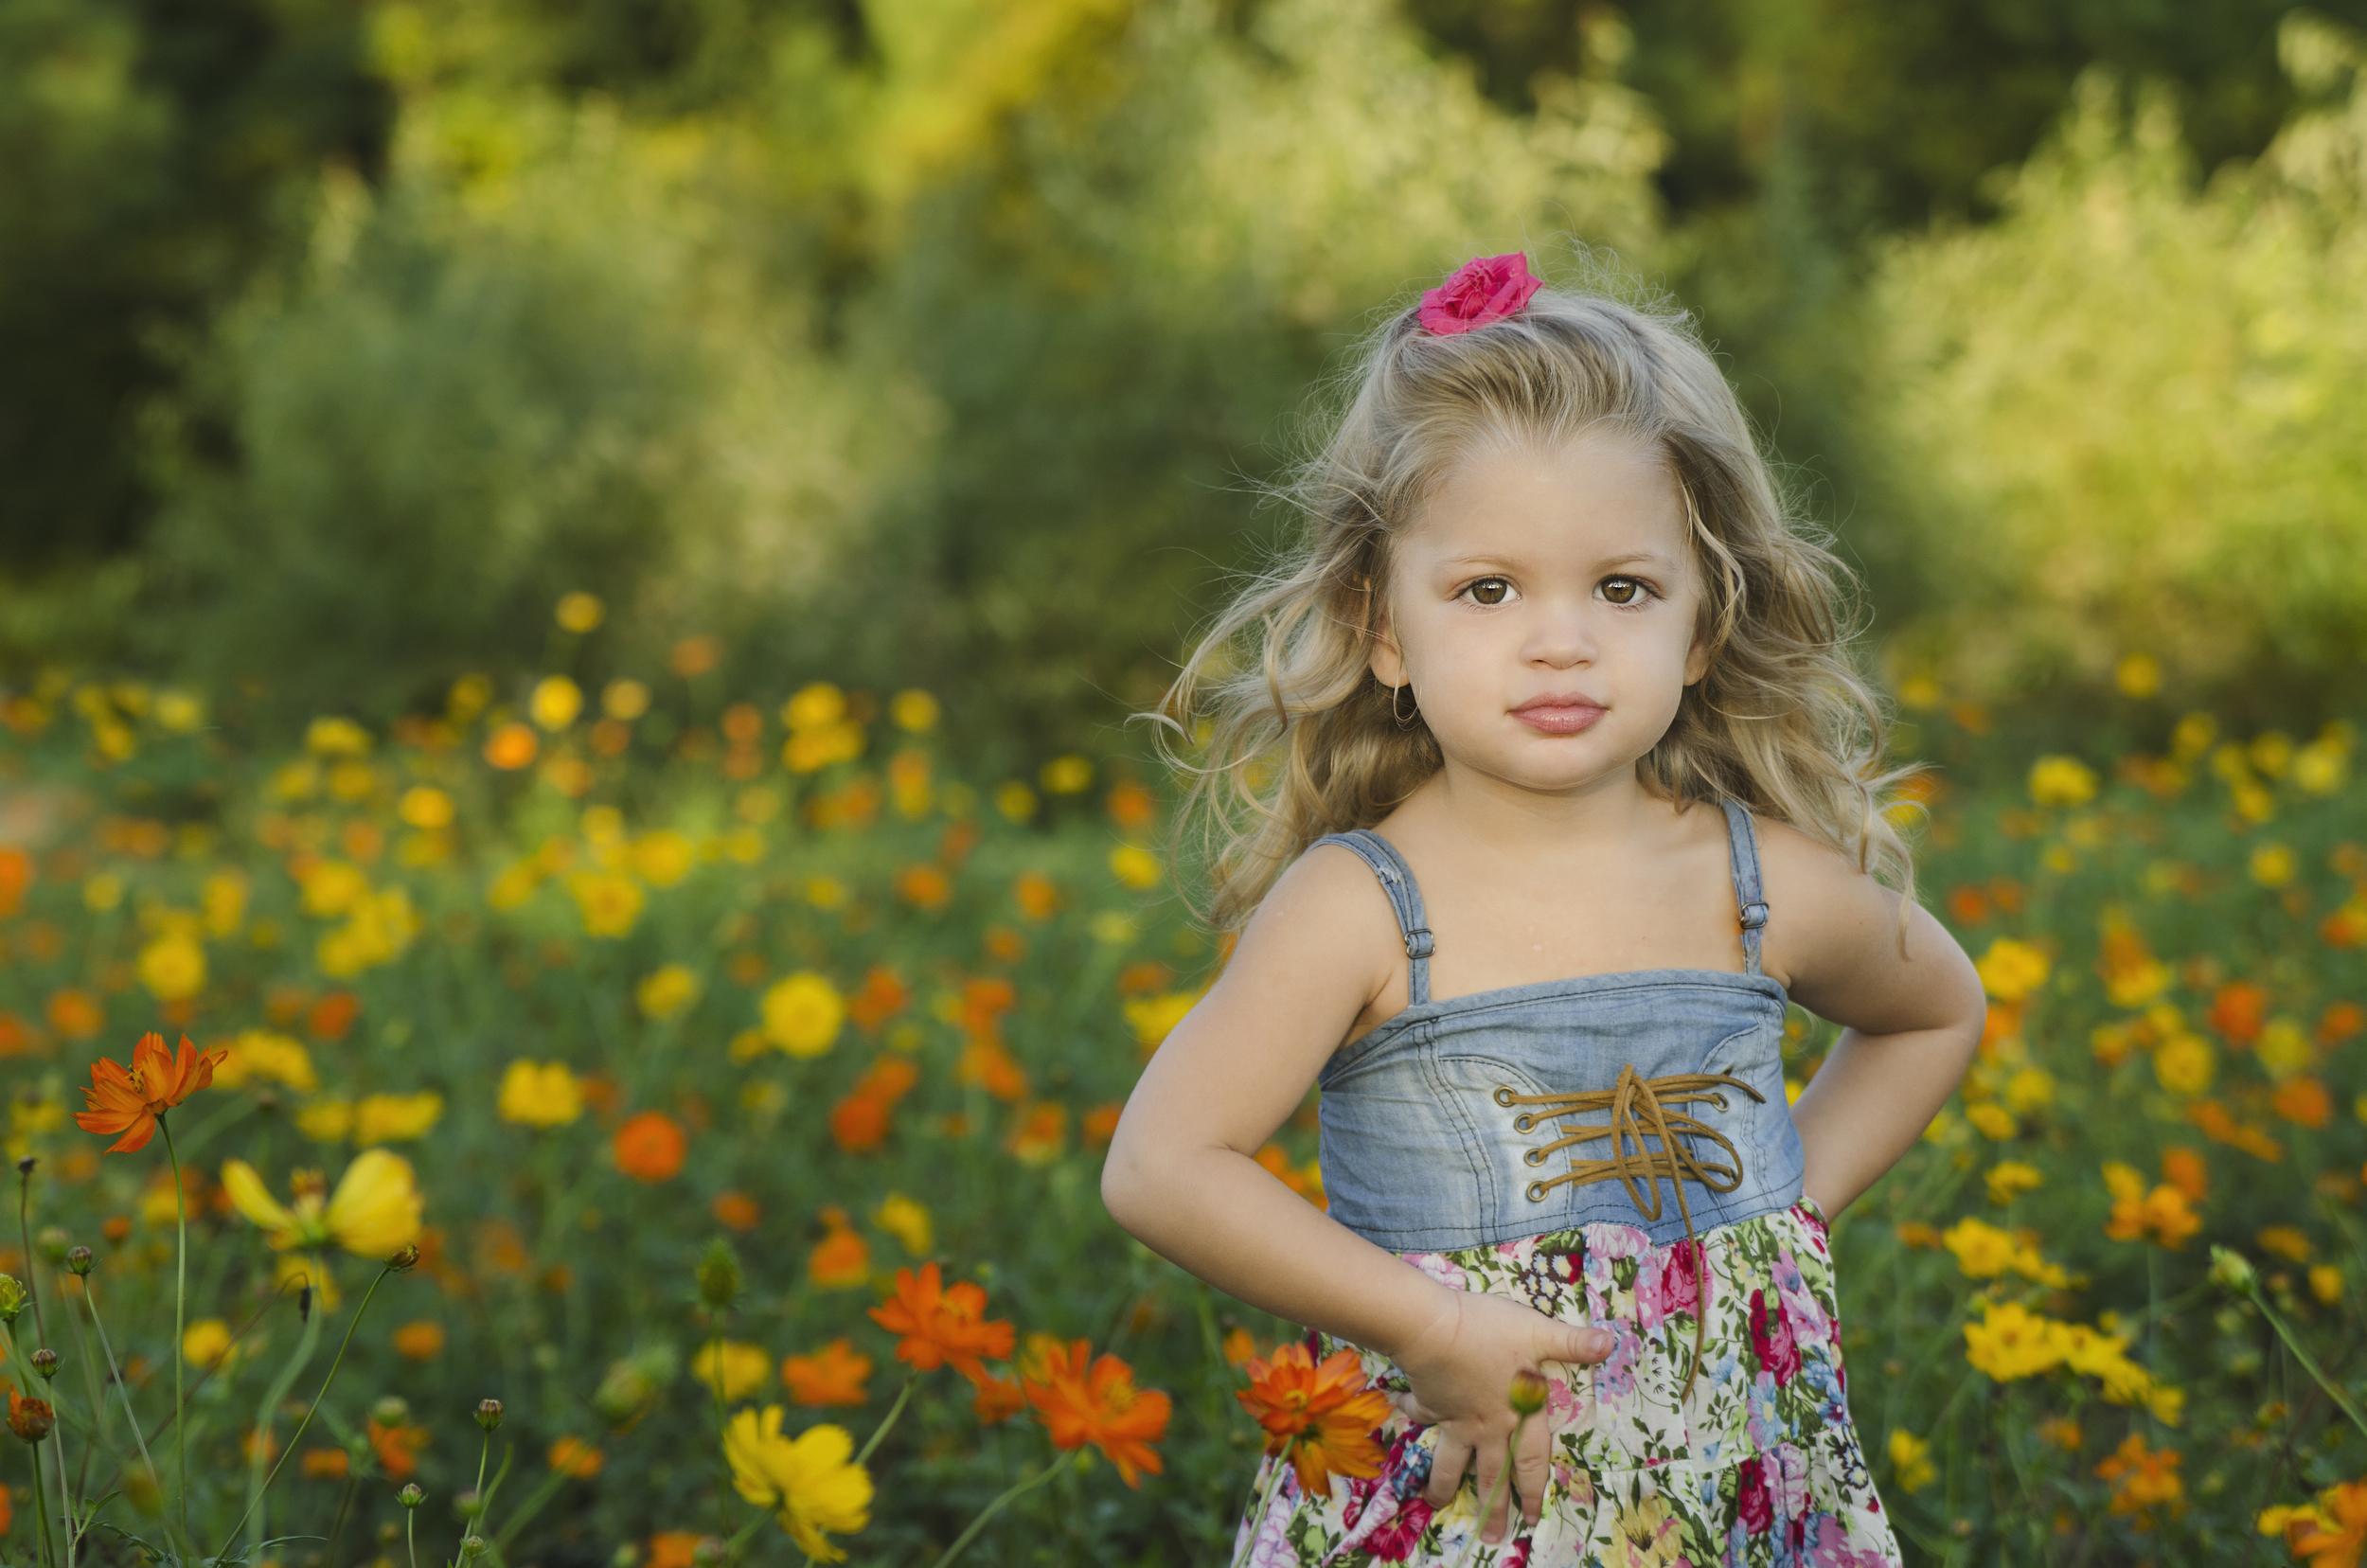 All Images 2012-2015 © Copyright Hannah Lamitina Photography